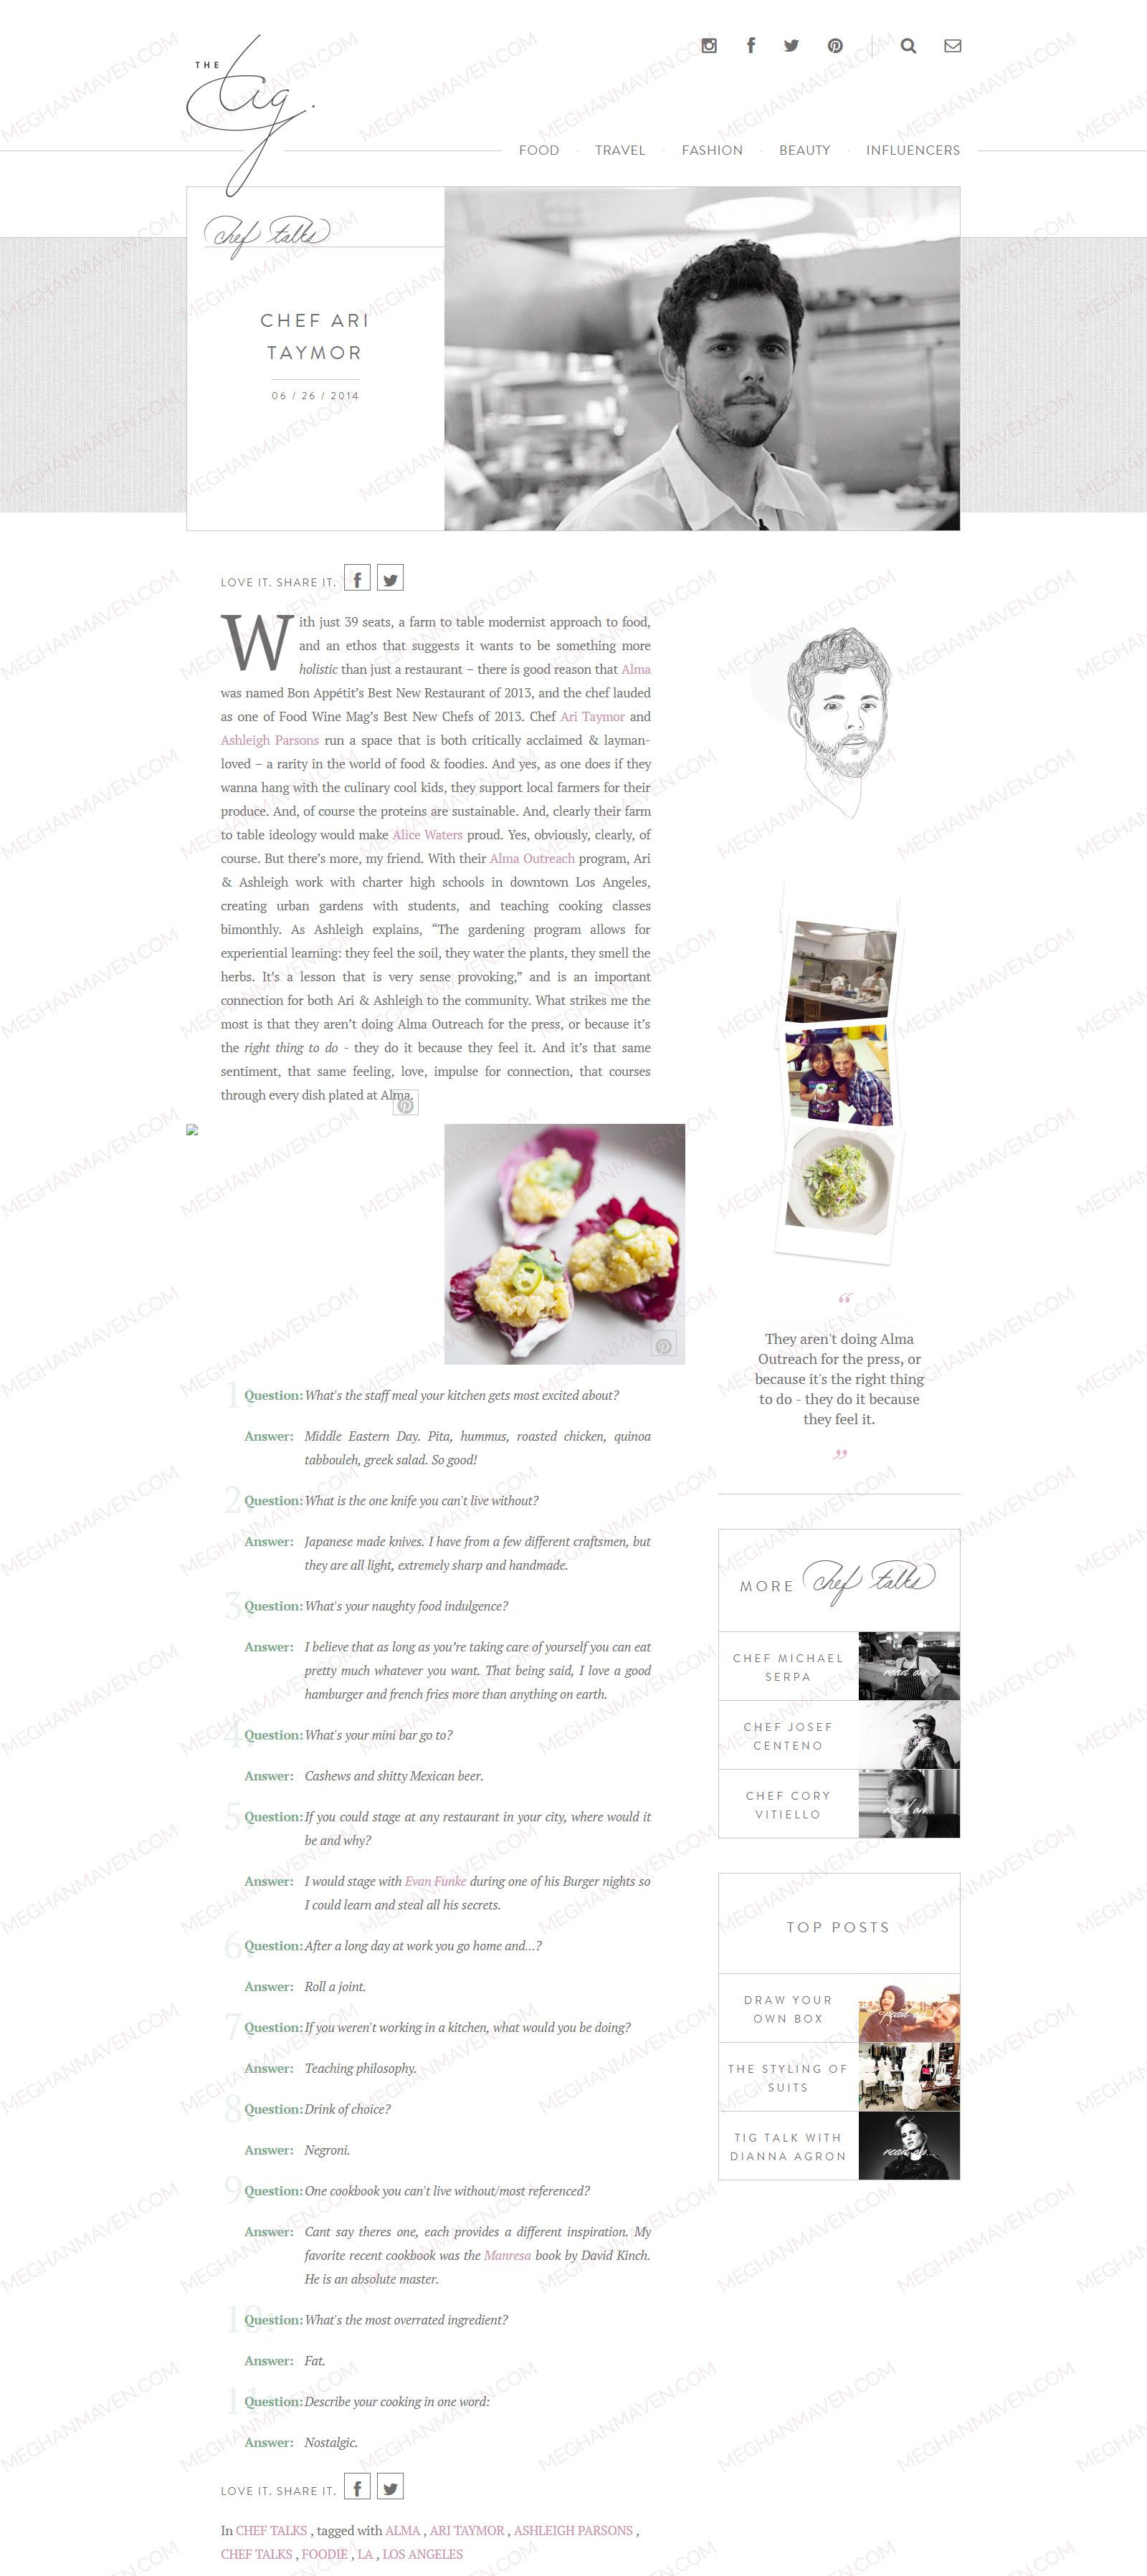 52ac8ff86e3 Chef Ari Taymor by Meghan Markle